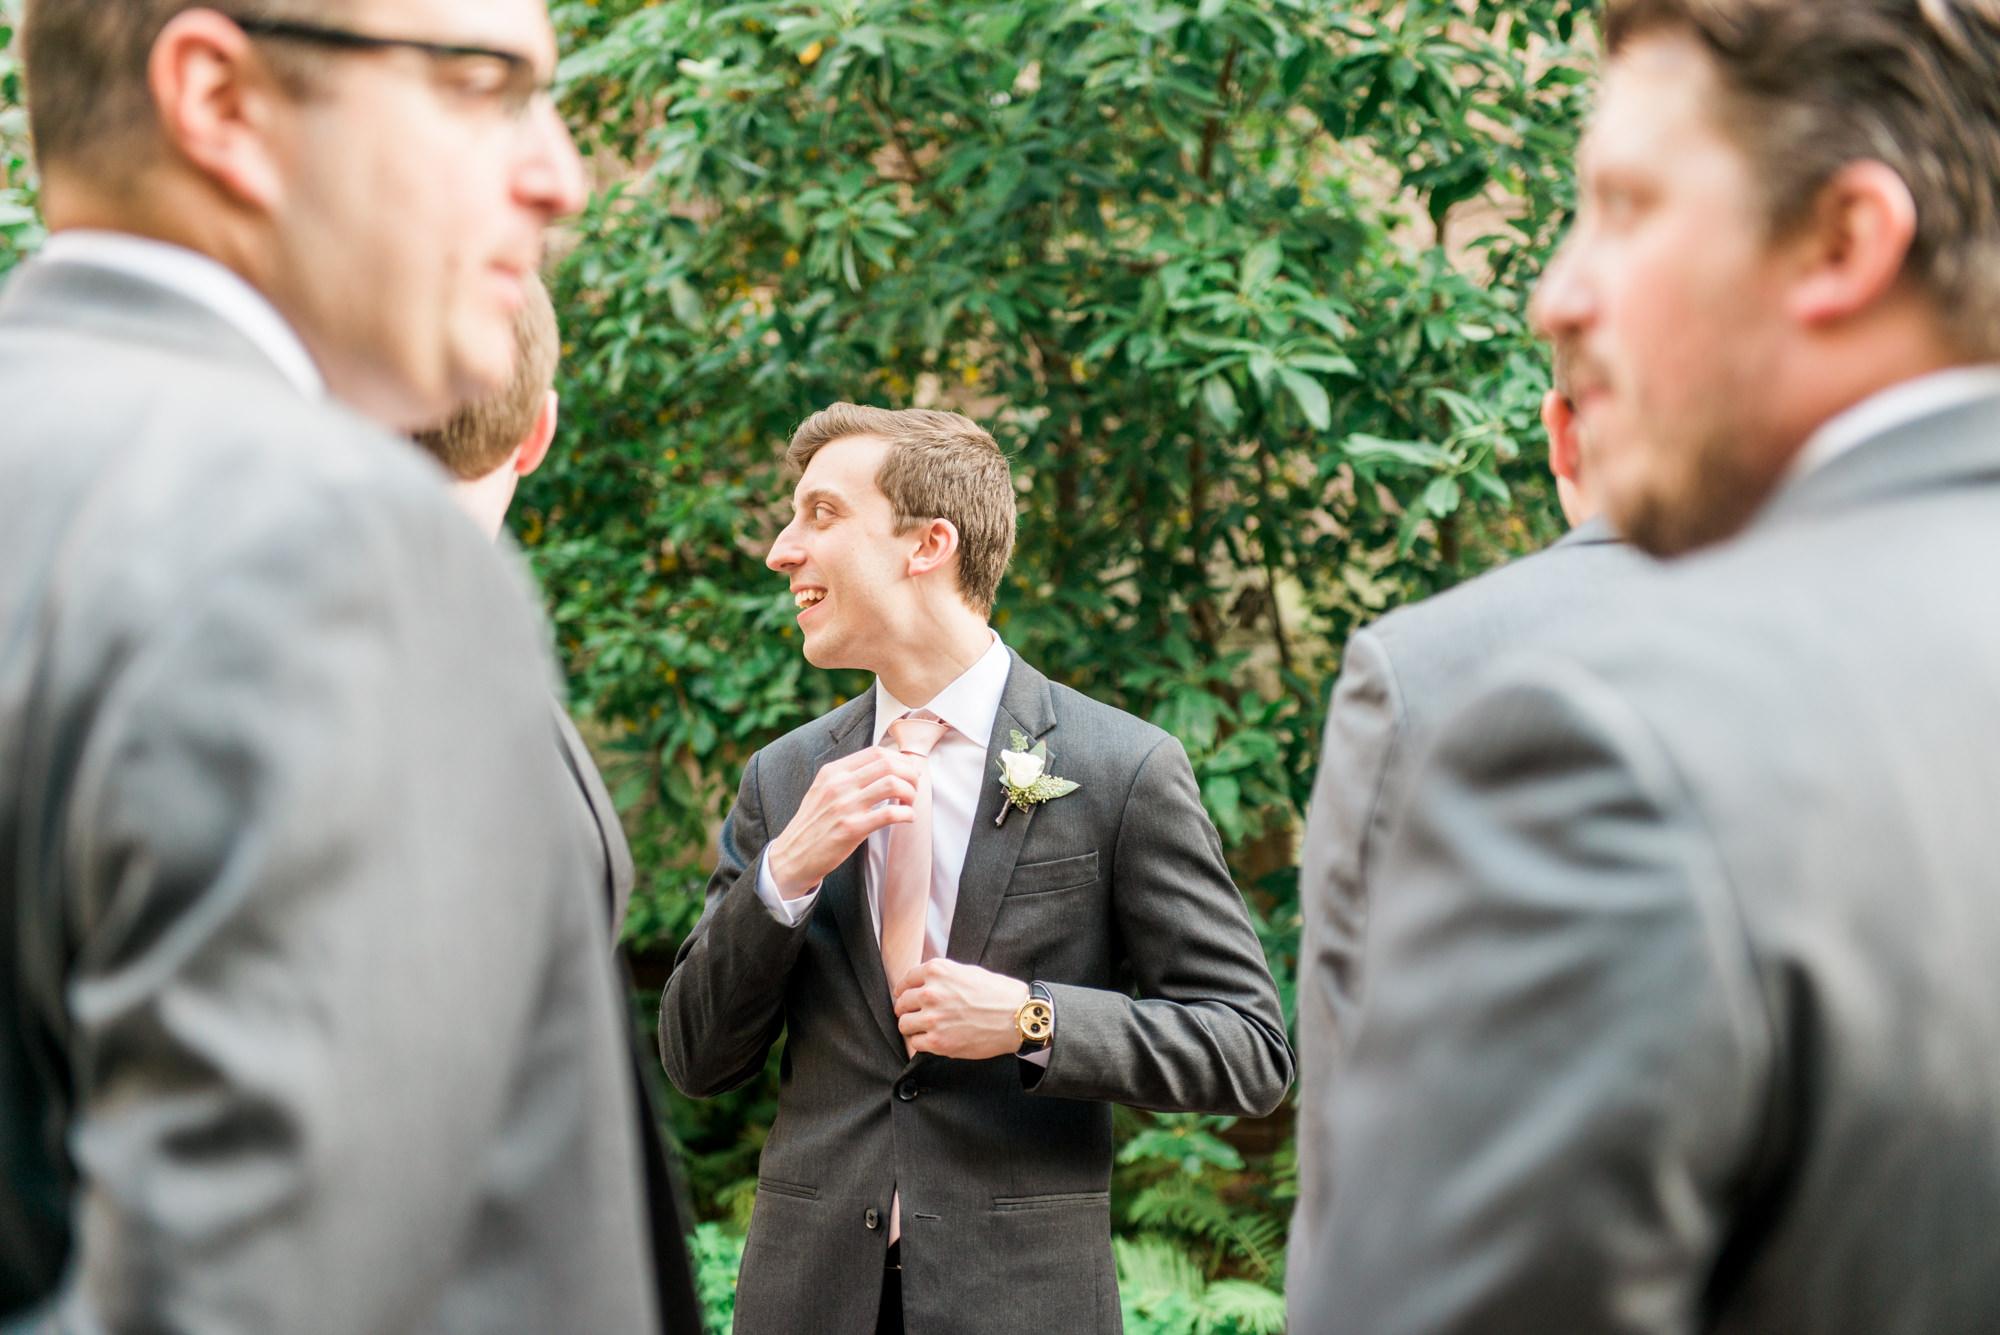 haley-richter-photography-autumn-college-of-physicians-wedding-philadelphia--171.jpg